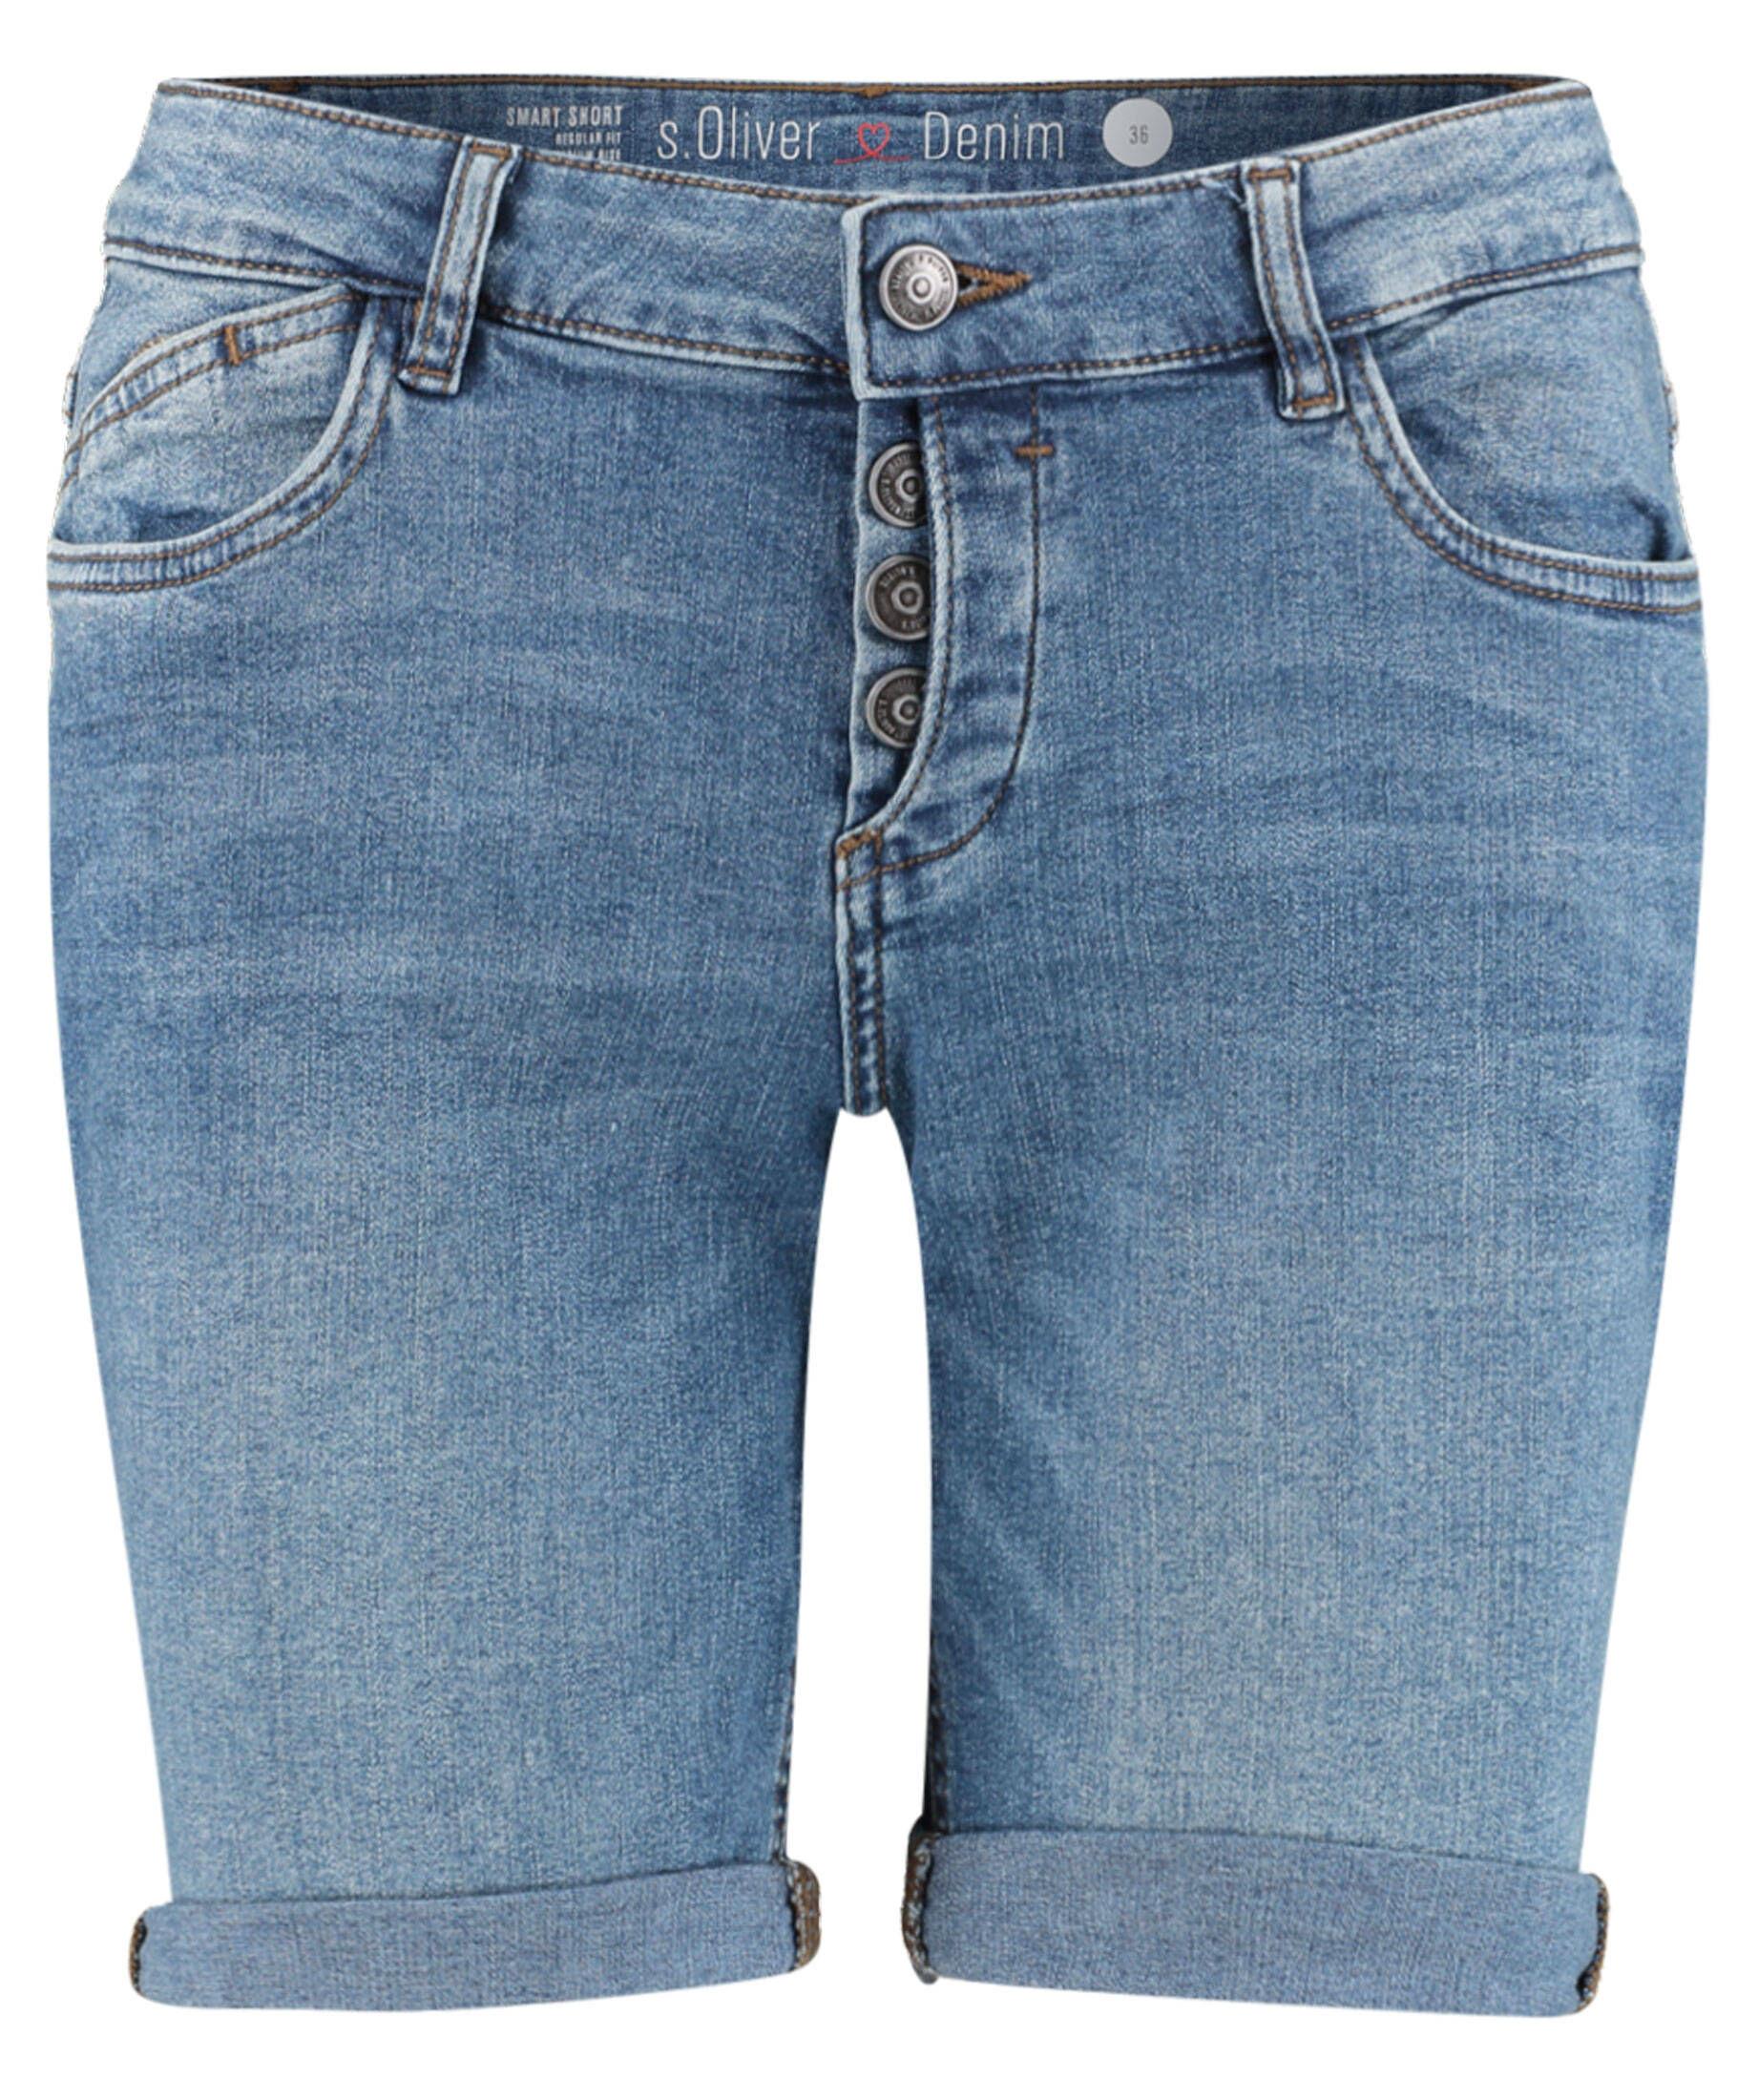 Shorts & Bermudas engelhorn fashion